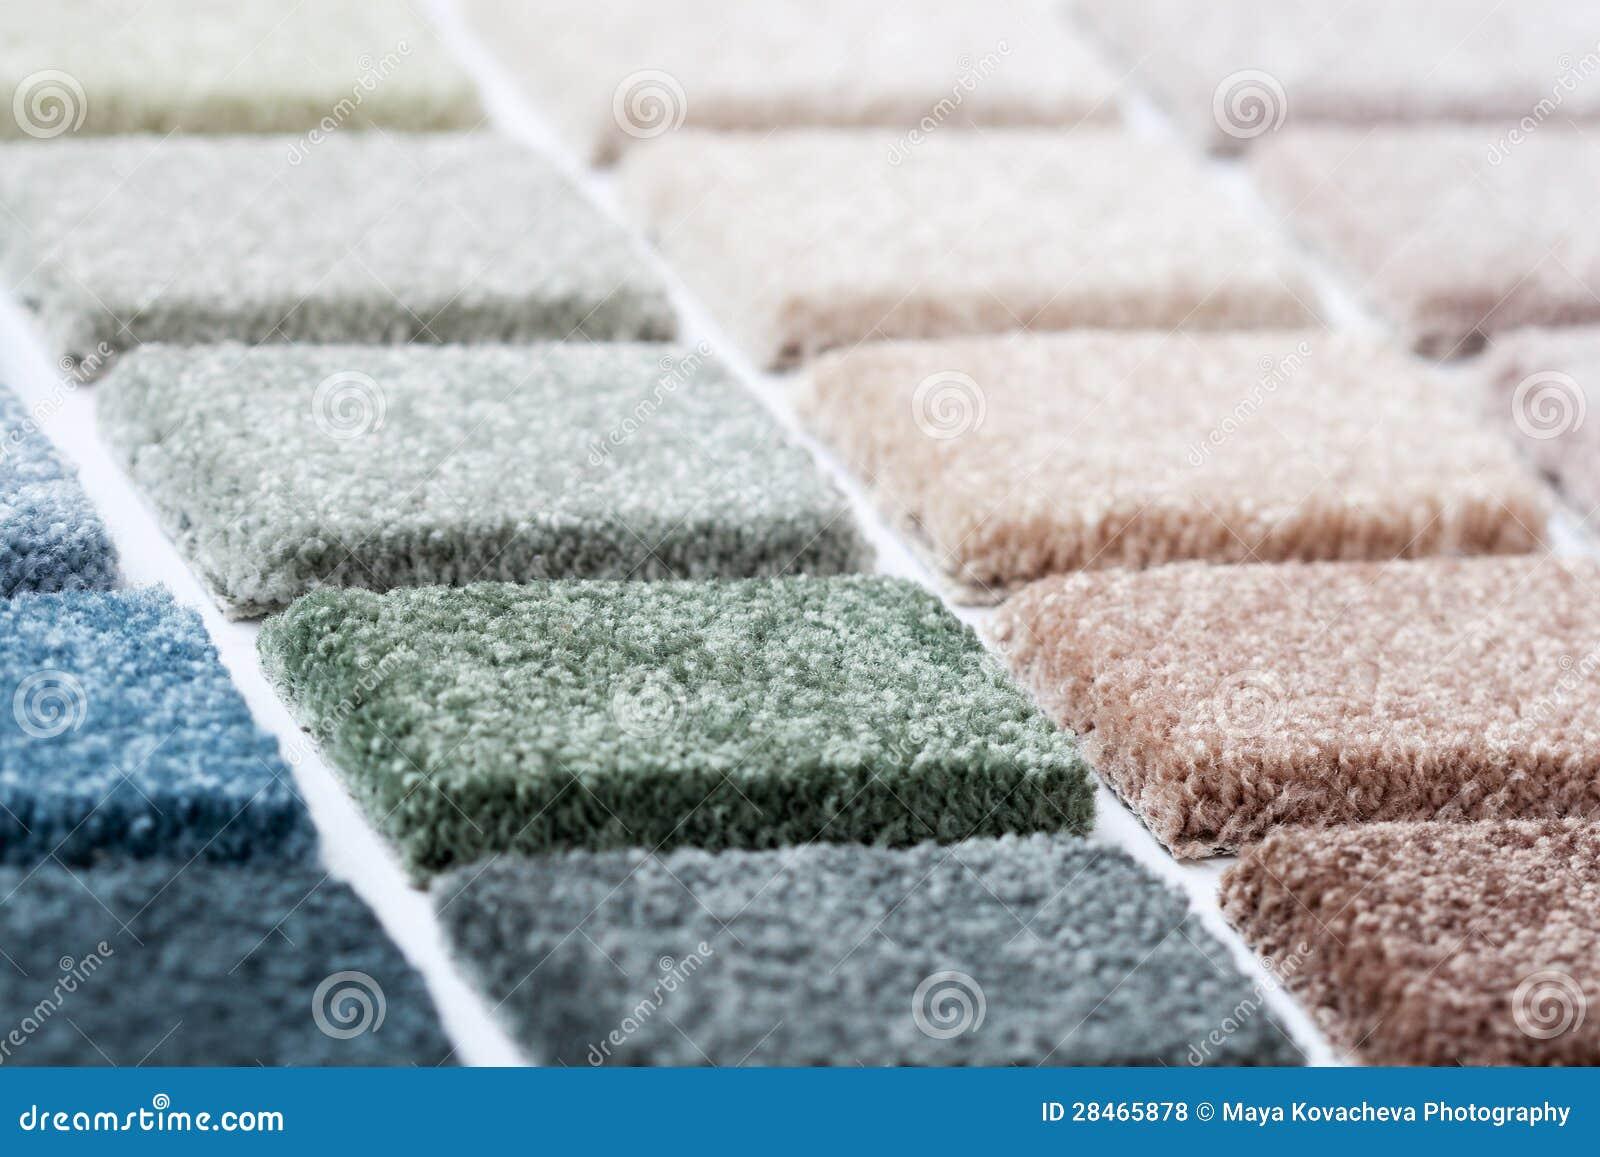 Carpet Samples Royalty Free Stock Photos - Image: 28465878